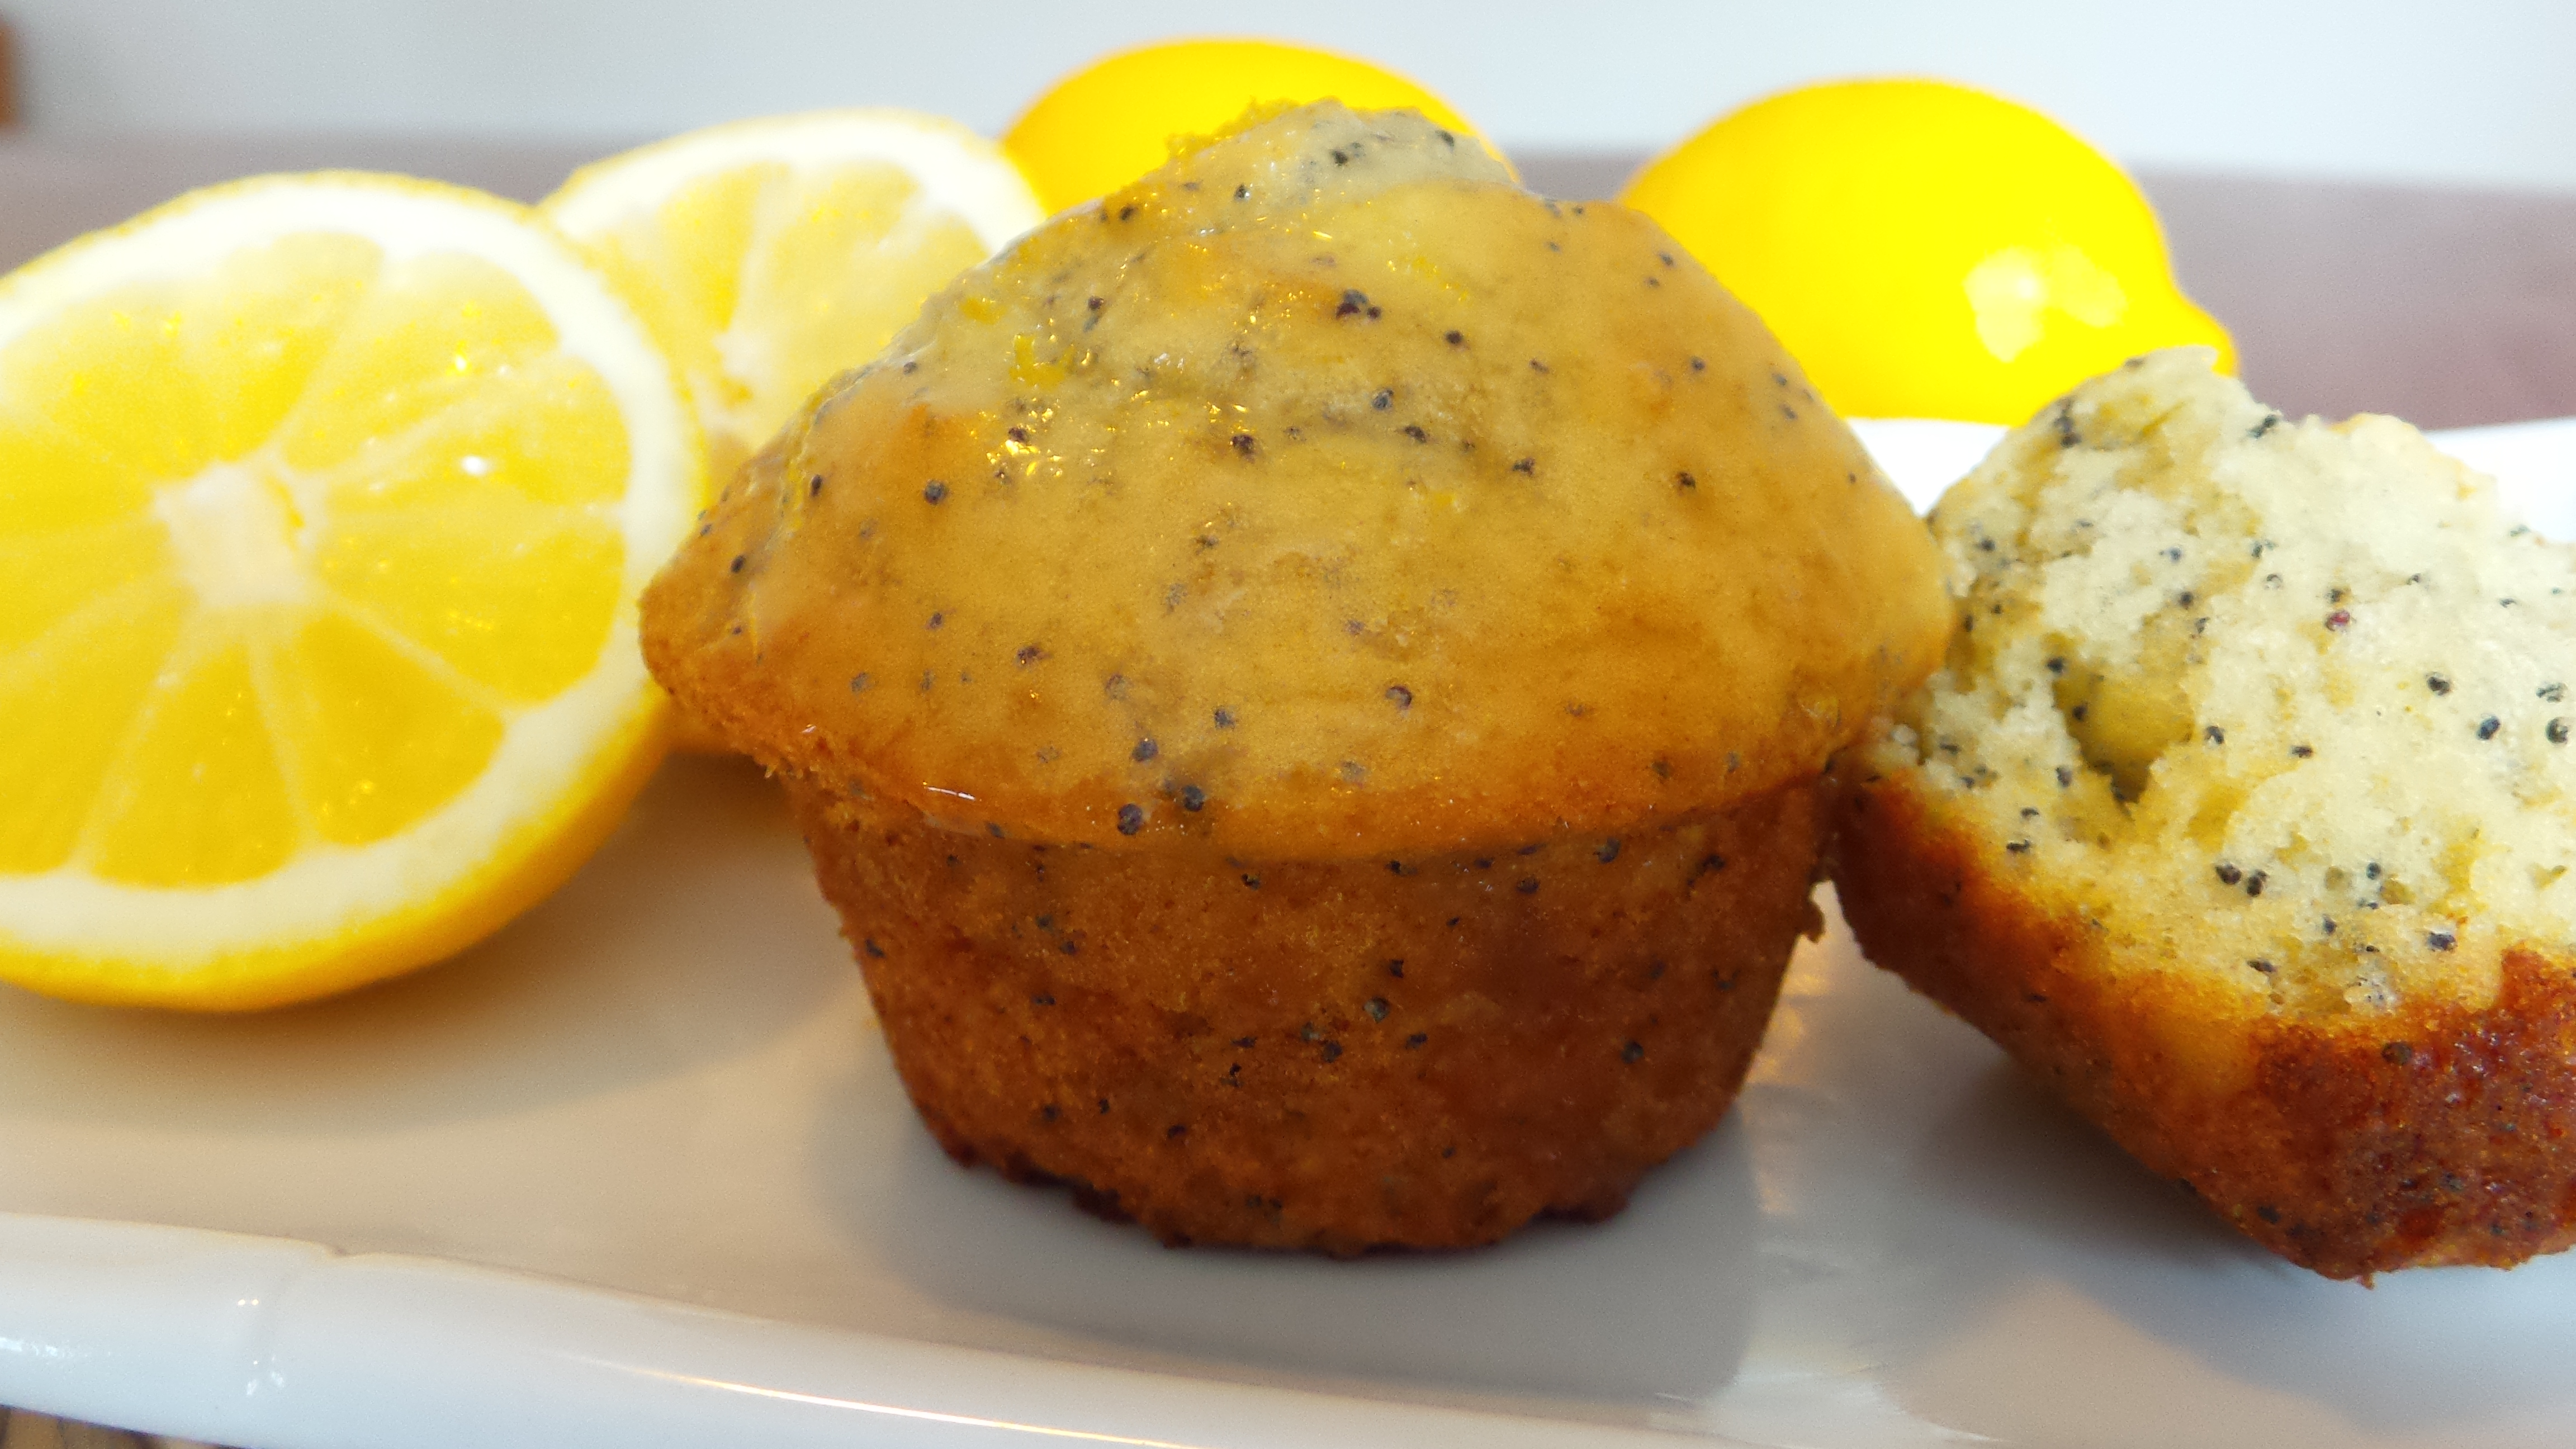 Lemon-Poppy Seed Muffins with Lemon Glaze   Recipes, Home ...